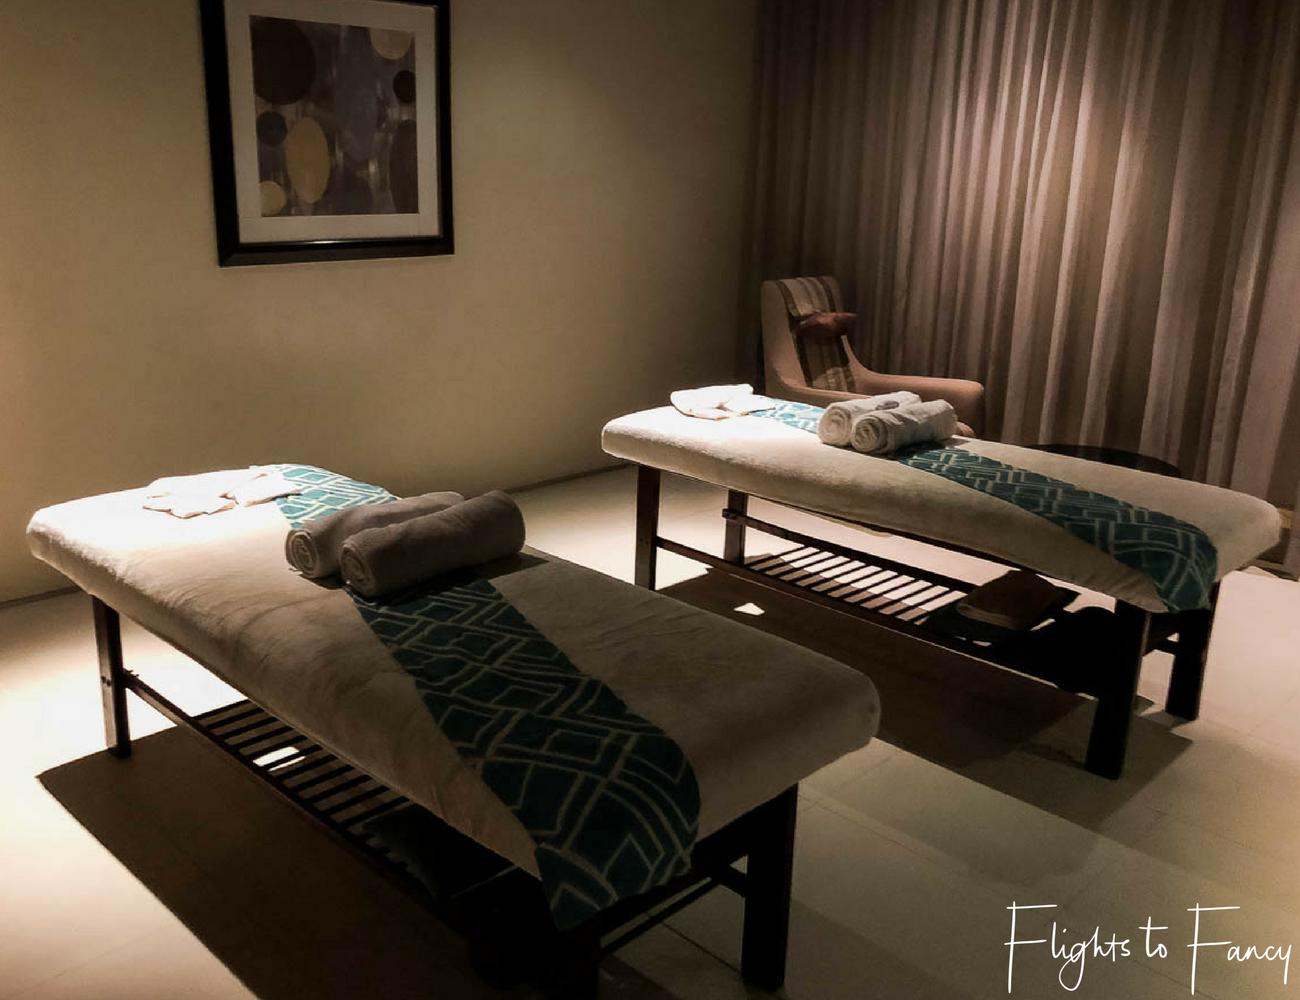 Hotel near SM Cebu City - Radisson Blue Cebu Couples Spa by Flights to Fancy